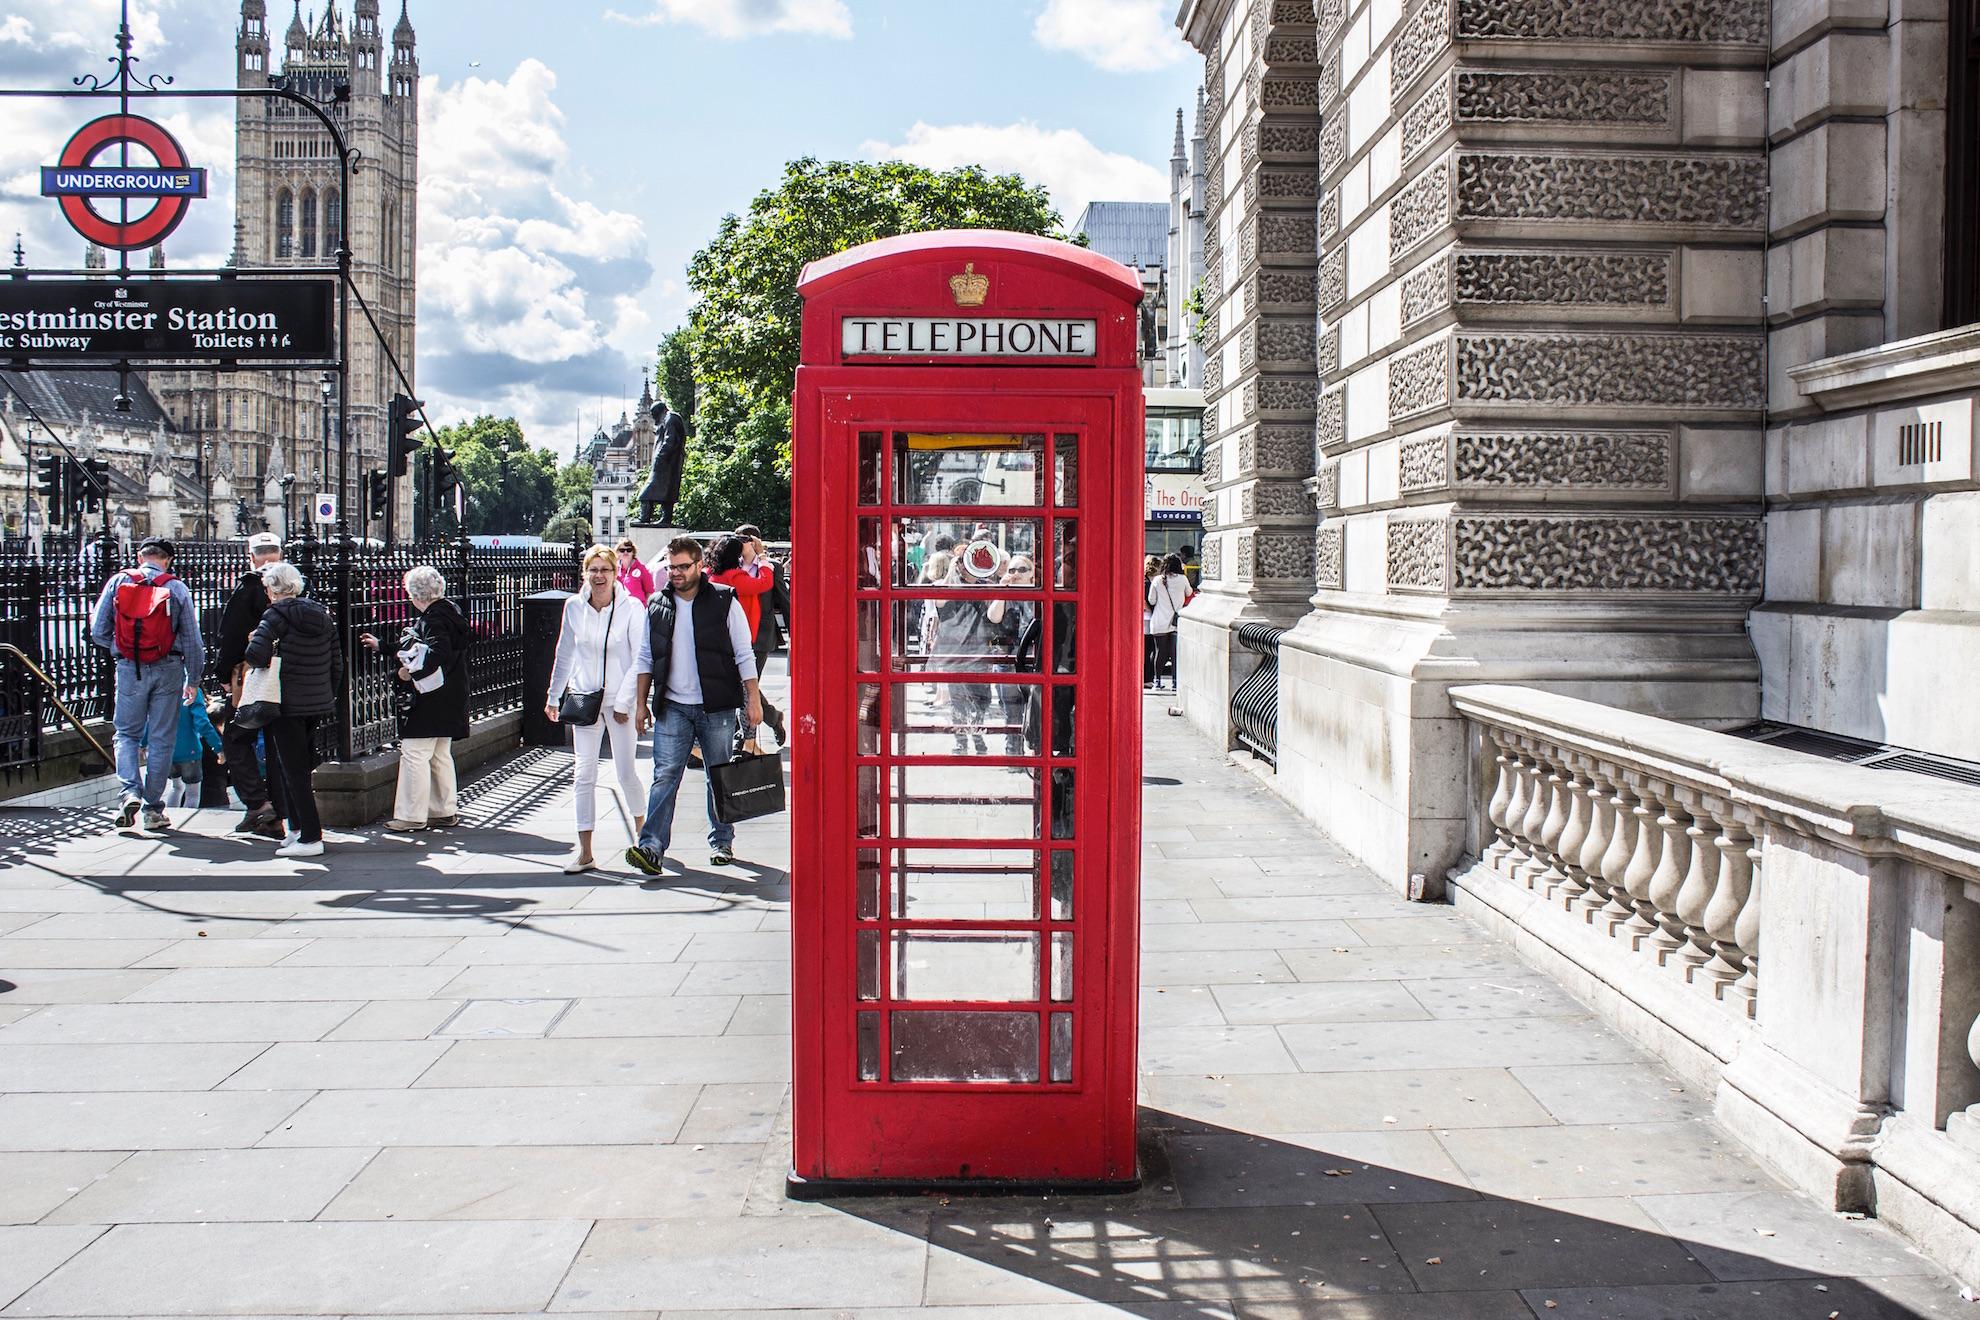 Photo: London, UK; Credit: Mathijs Lemmers http://bit.ly/2h3brrj